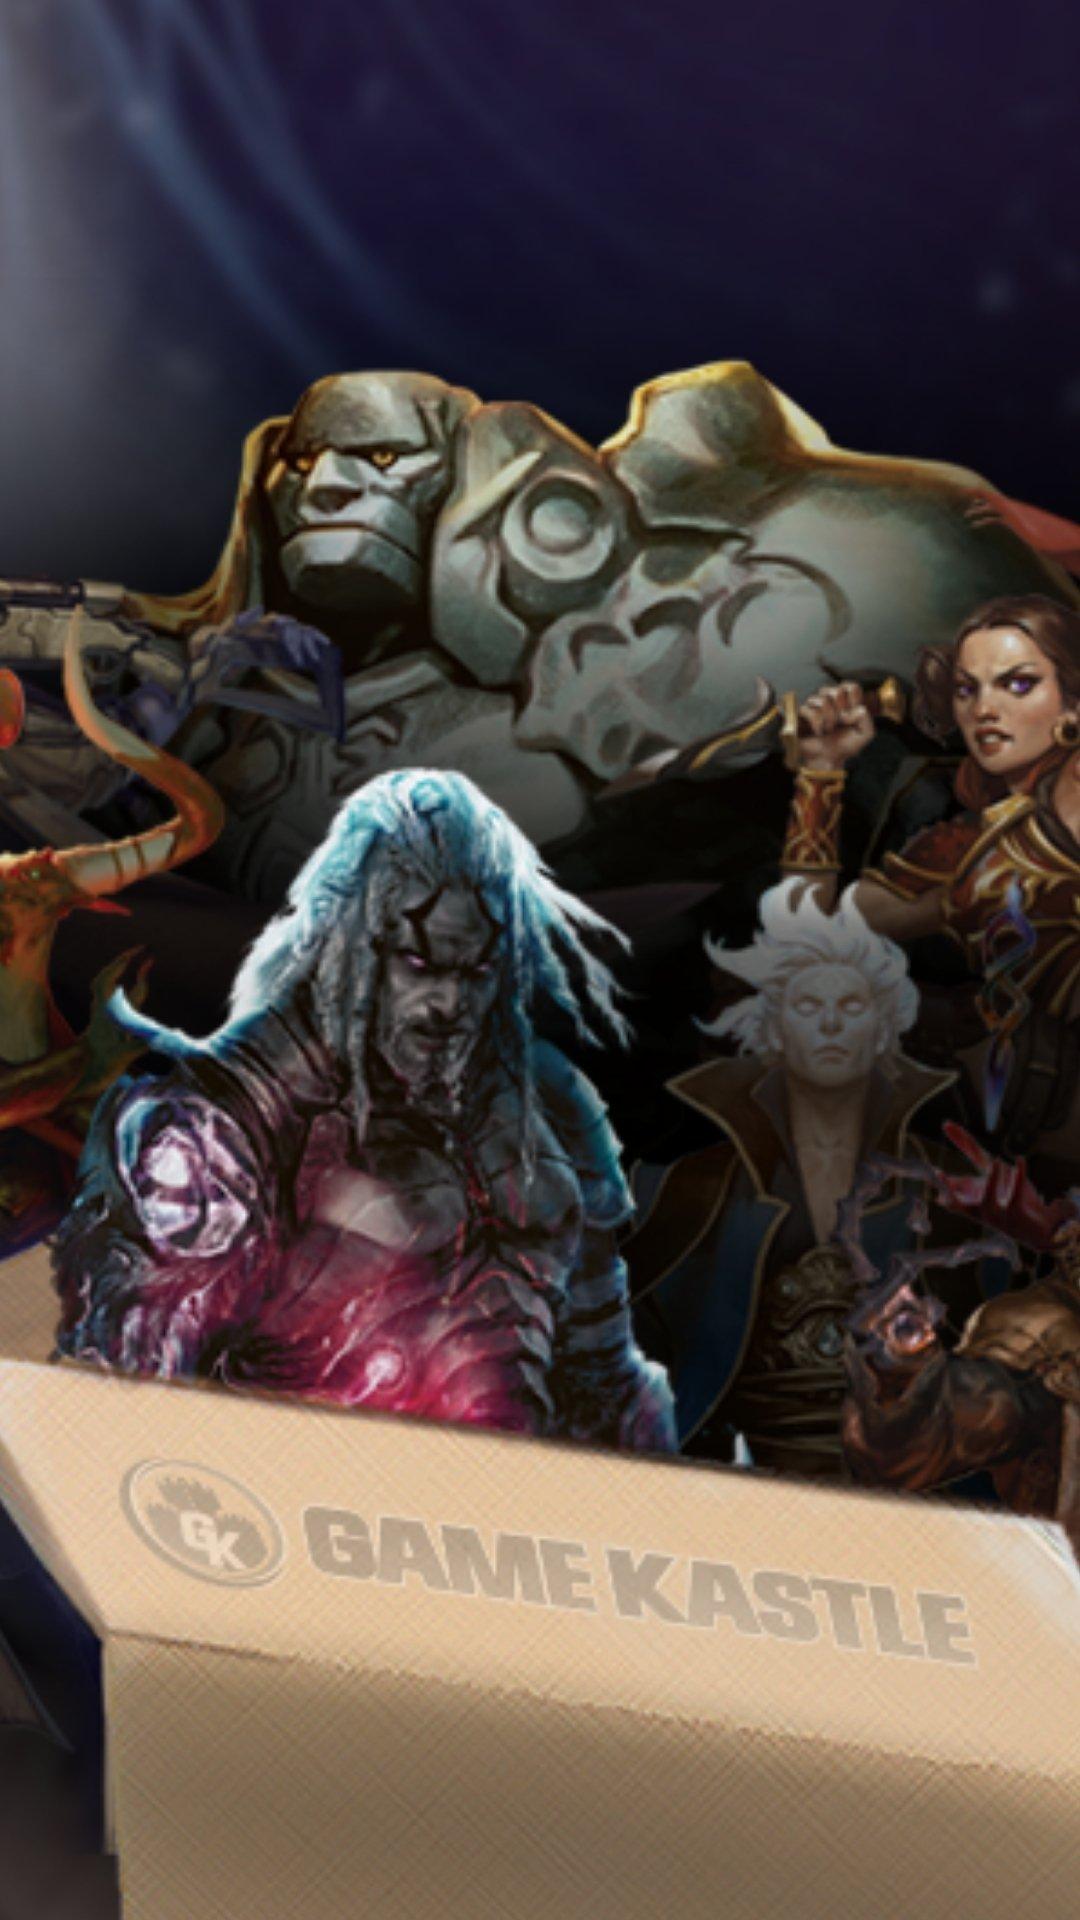 https://www.gamekastle.com/online/images/uploads/FREESHIP3_Mo.jpg